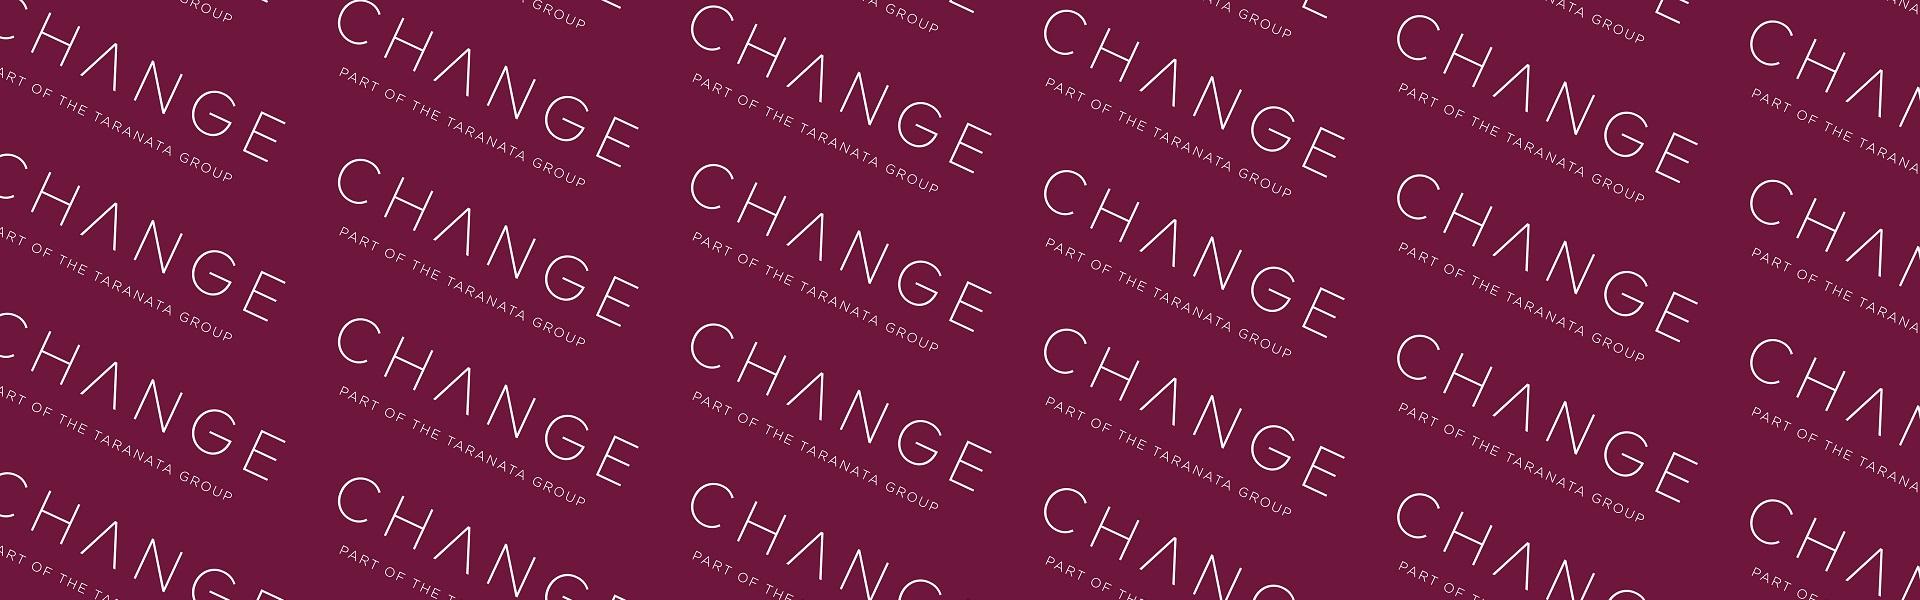 Change Recruitment